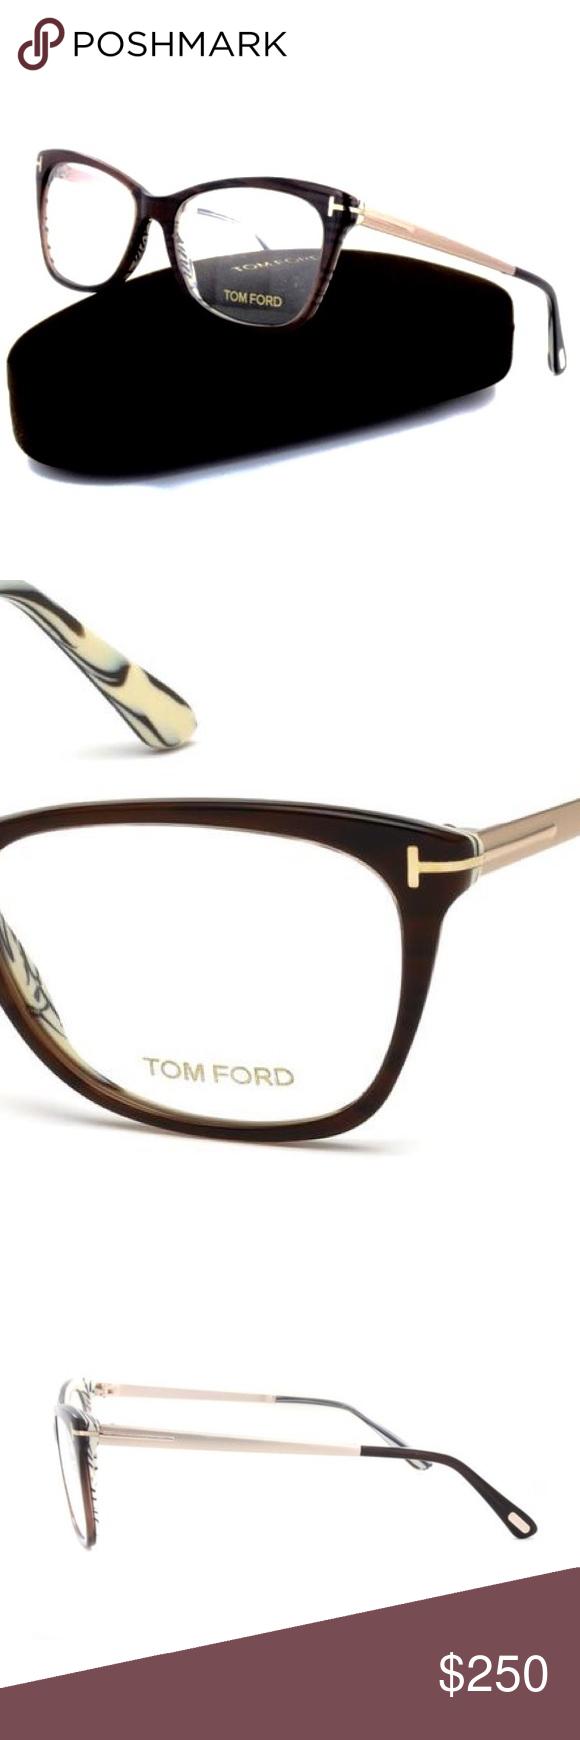 18202d64b9 Tom Ford Optical Frames (TF5353) New Tom Ford 5353 050 52mm Eyeglasses. The